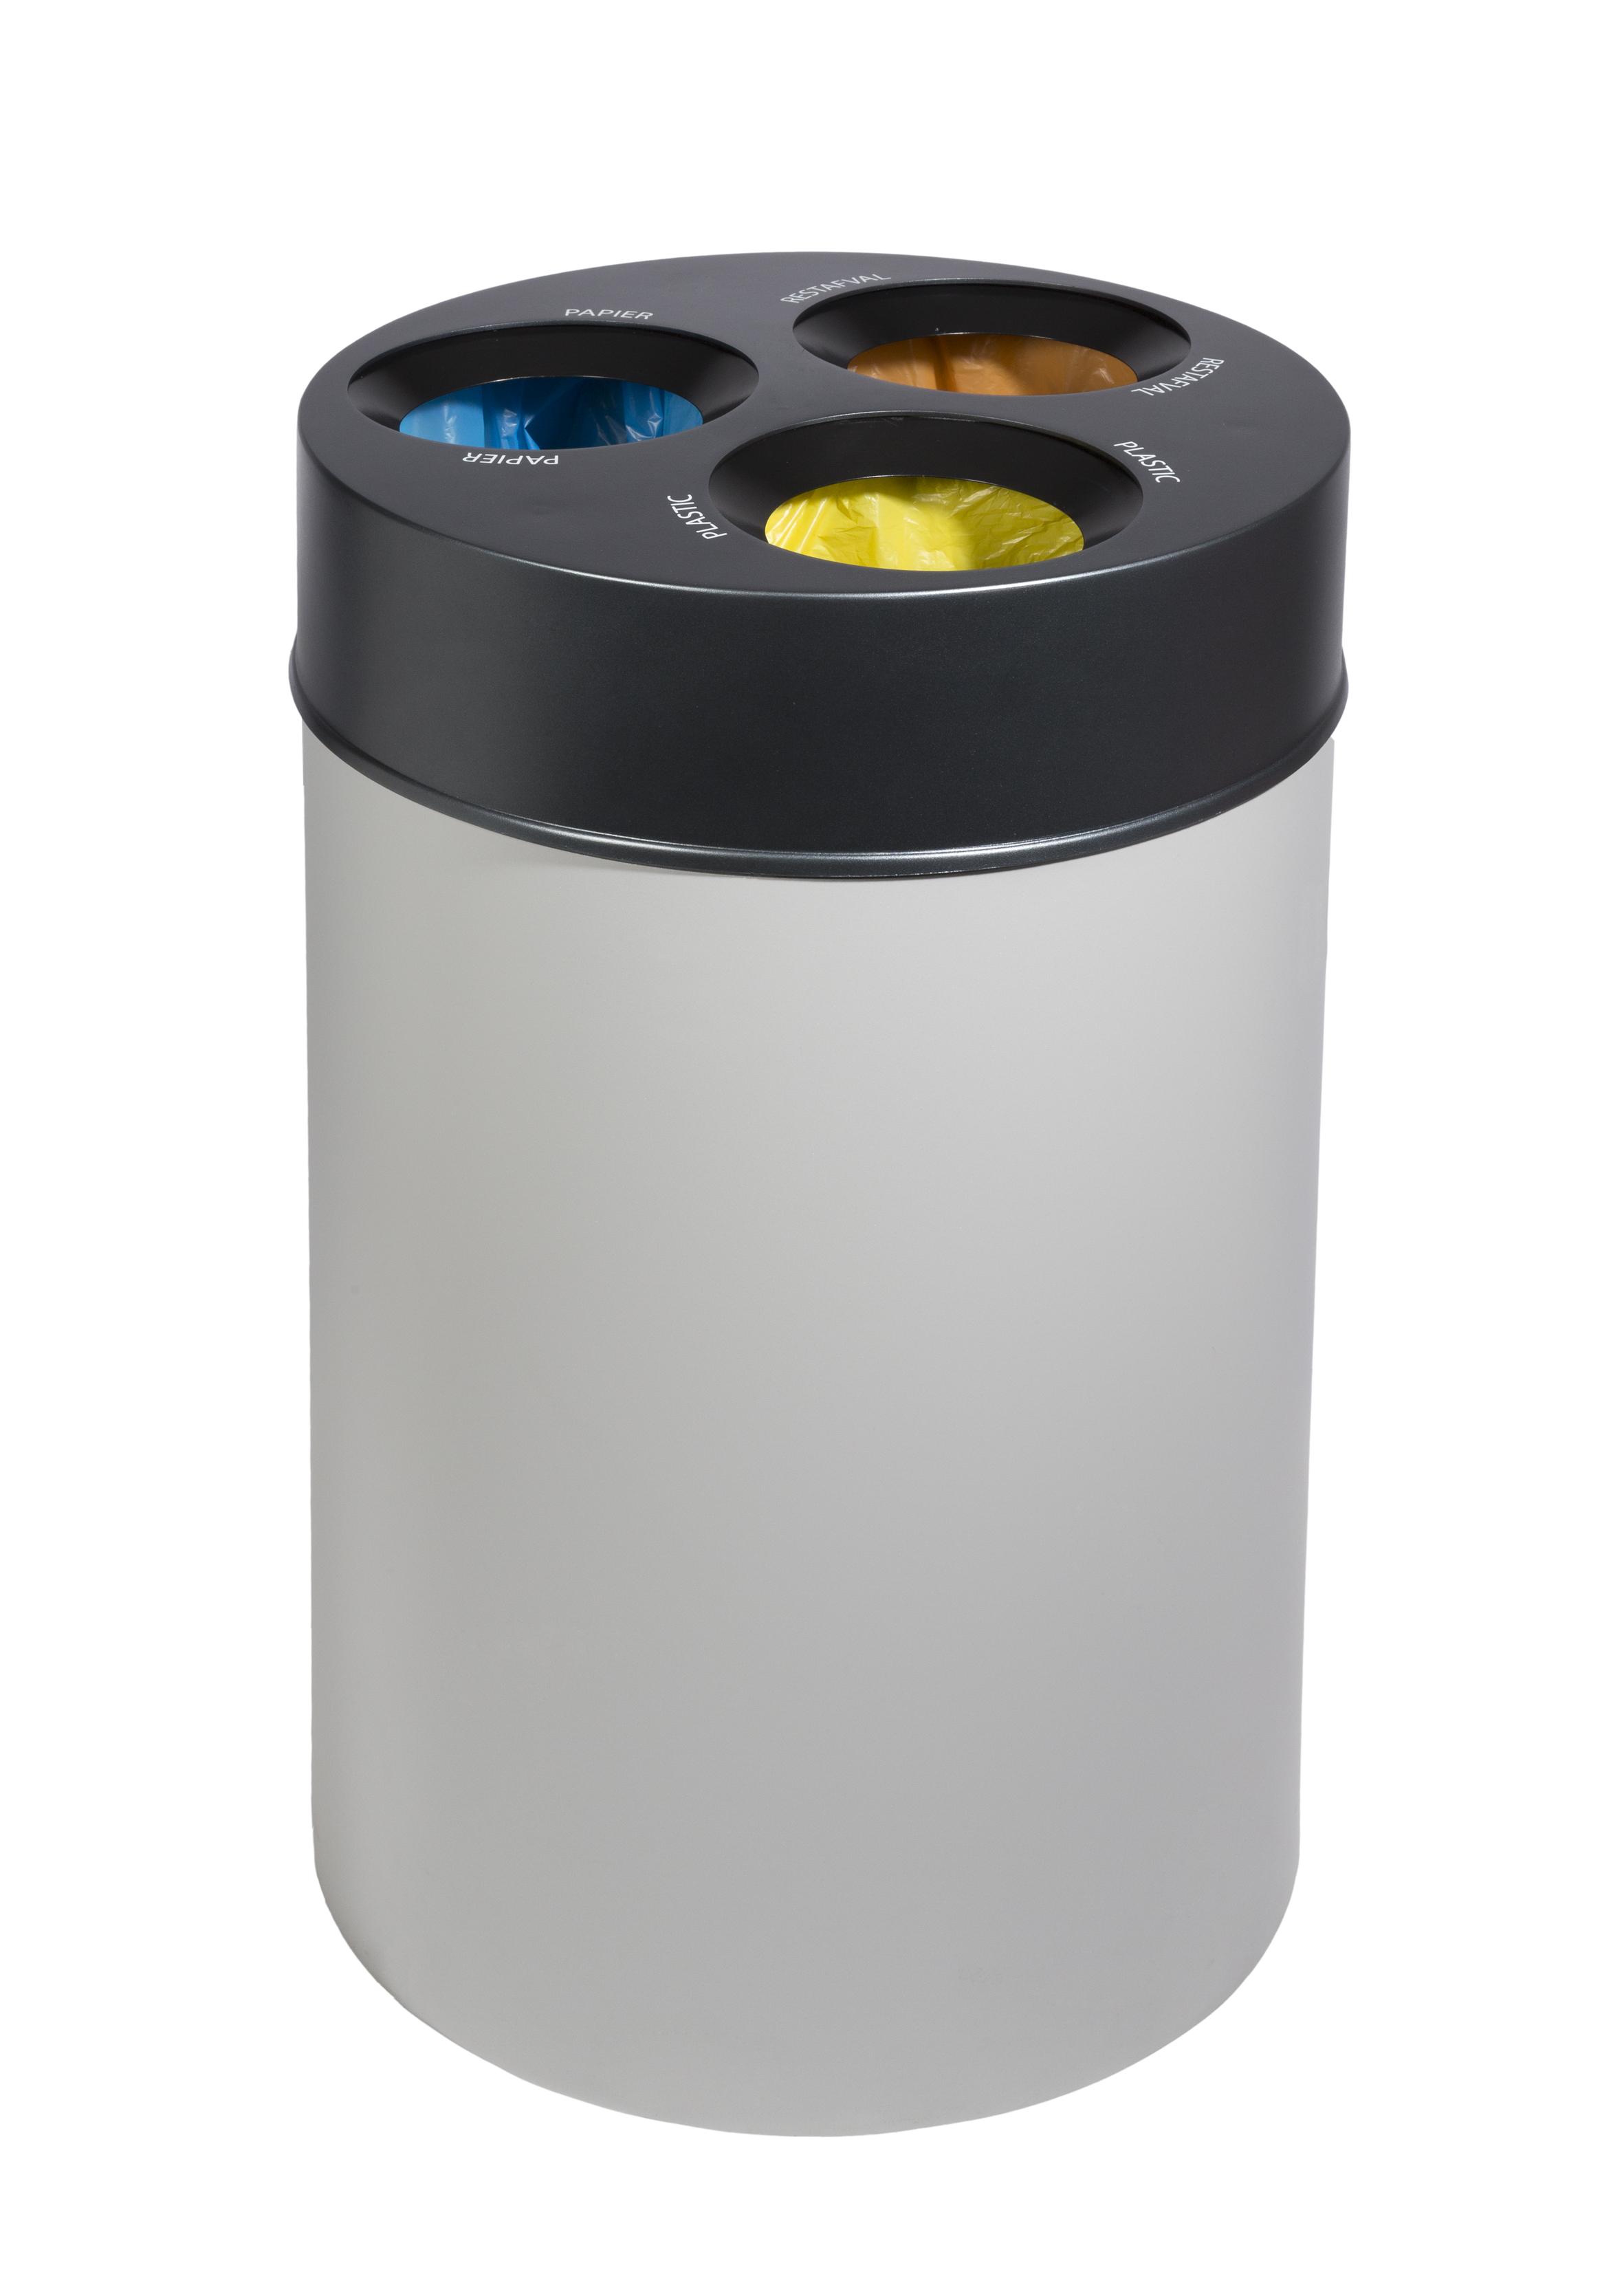 Pepper afvalbak met afvalscheiding